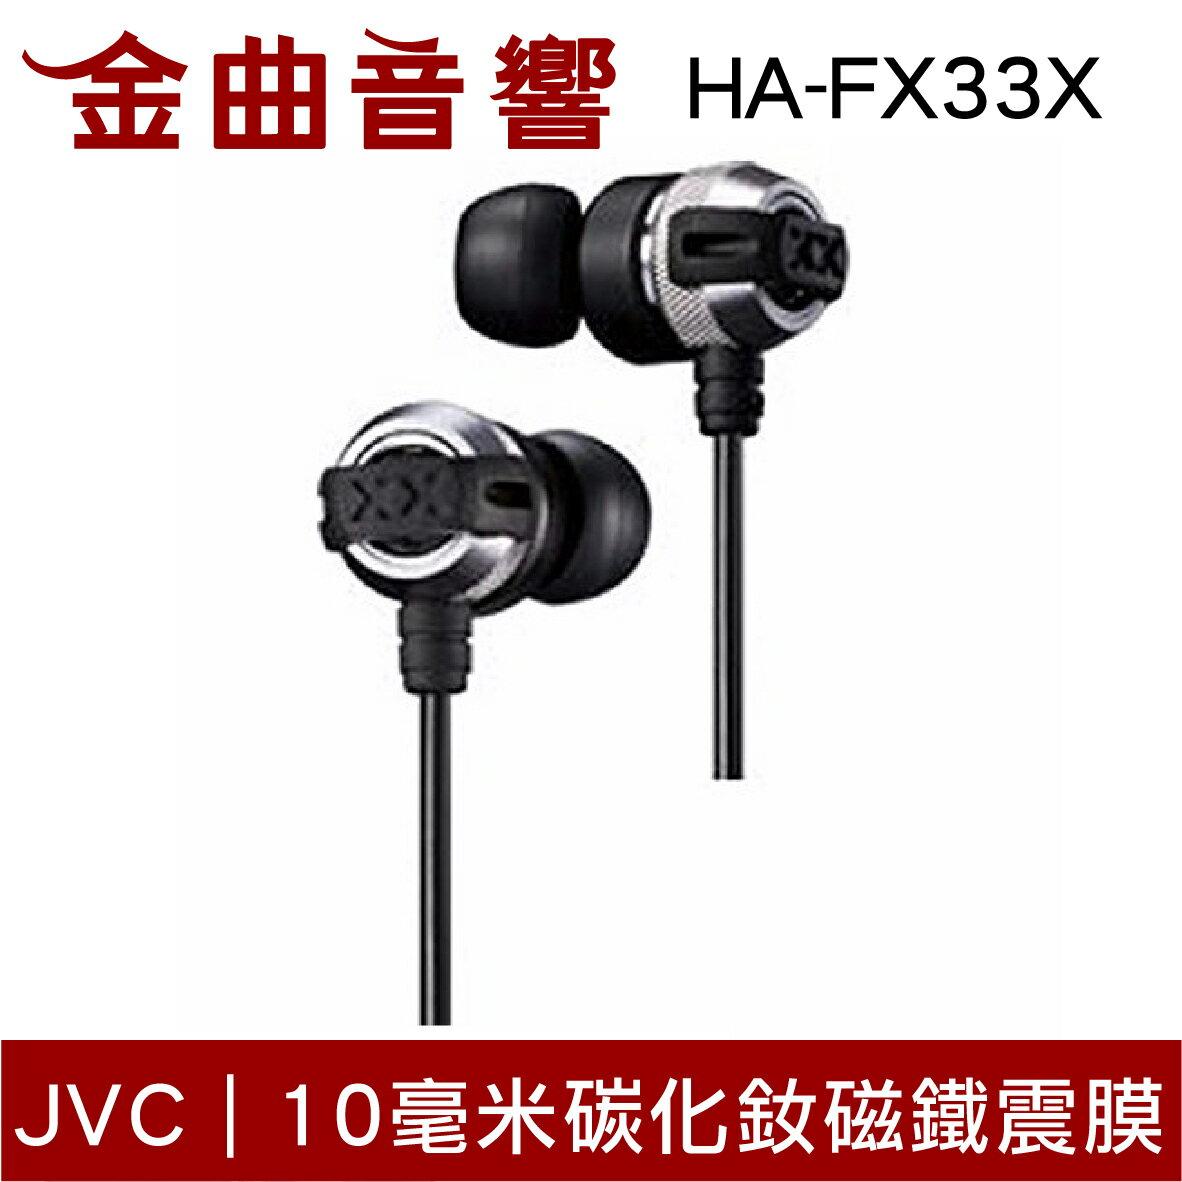 JVC 超重低音系列 HA-FX33X 銀噪音隔離 耳道式耳機 | 金曲音響